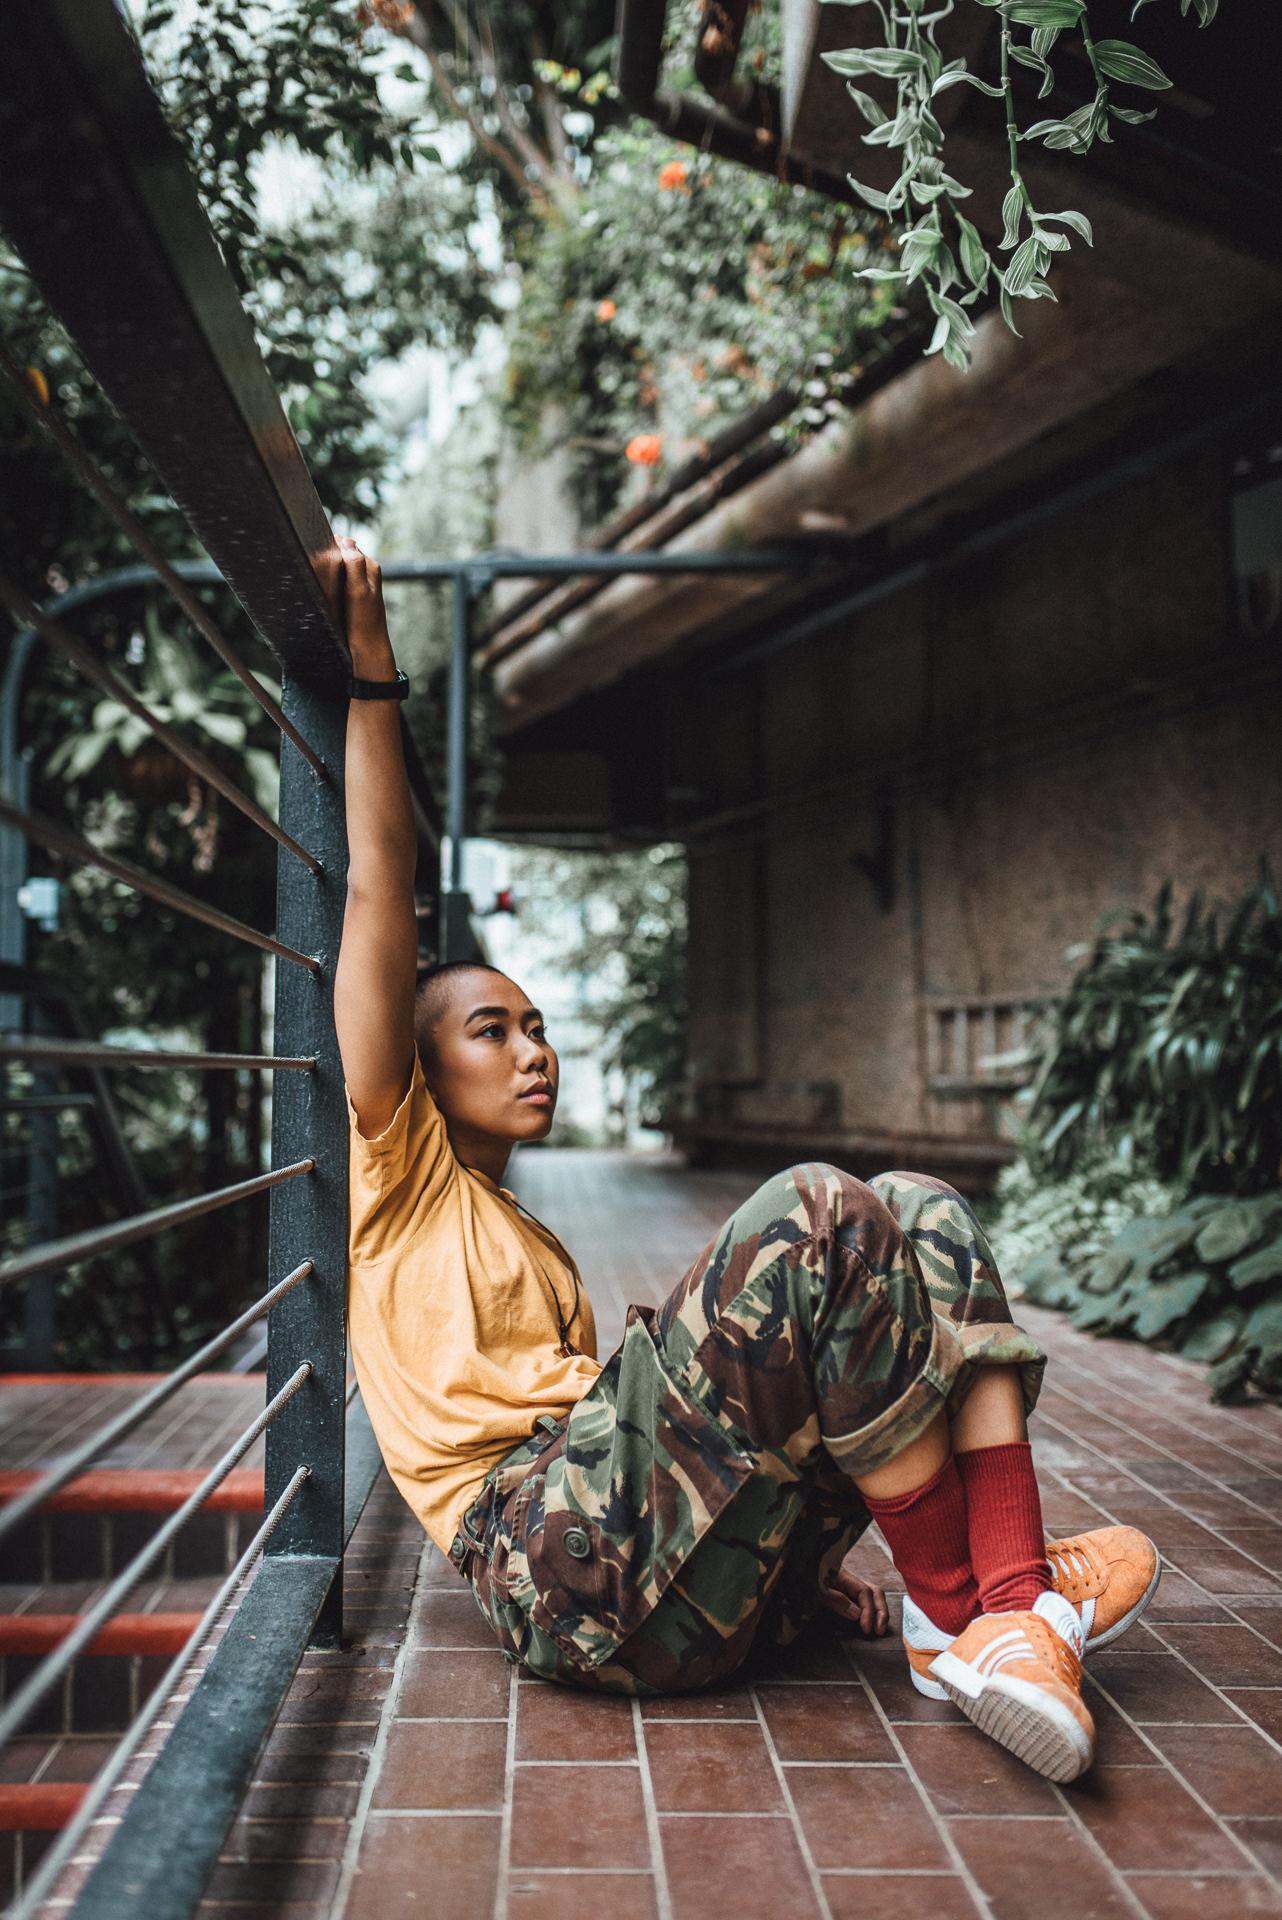 creative, alternative dance photography